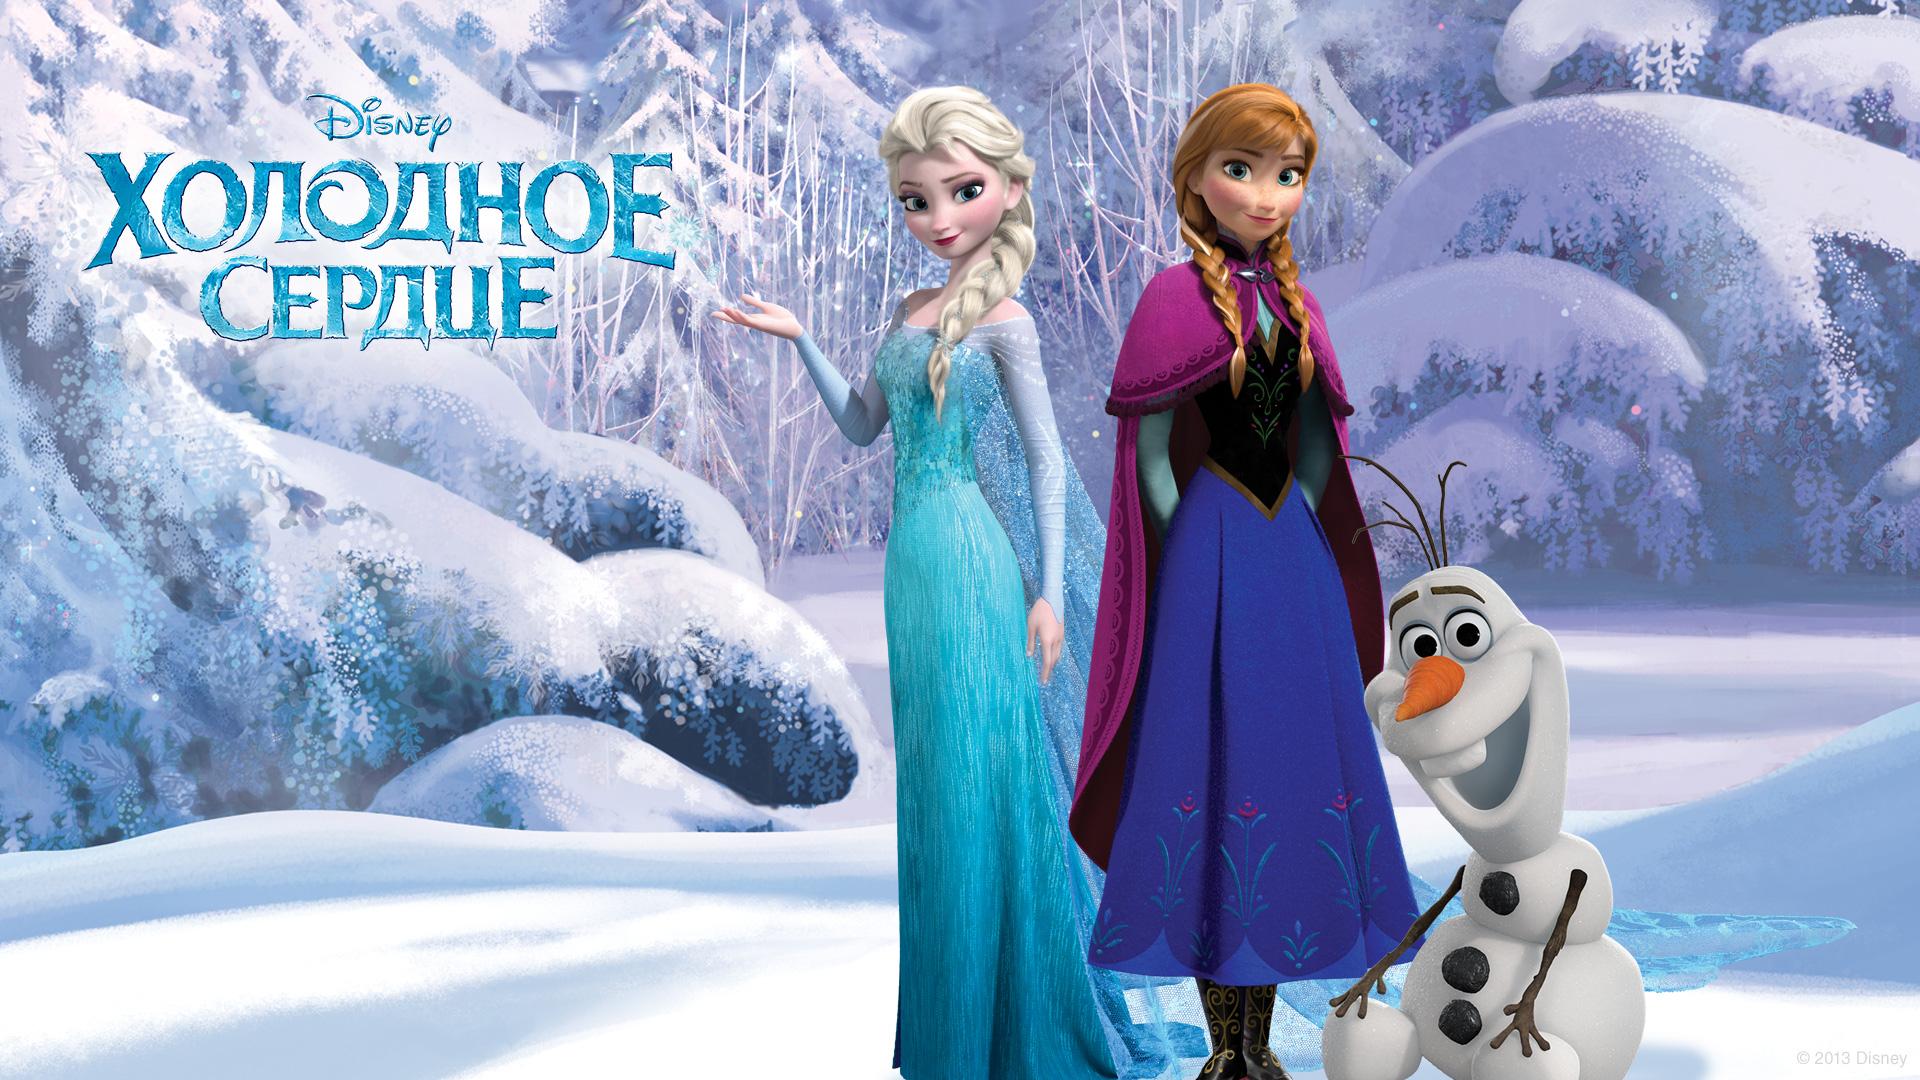 Elsa and Anna image elsa and anna 36252701 1920 1080jpg 1920x1080